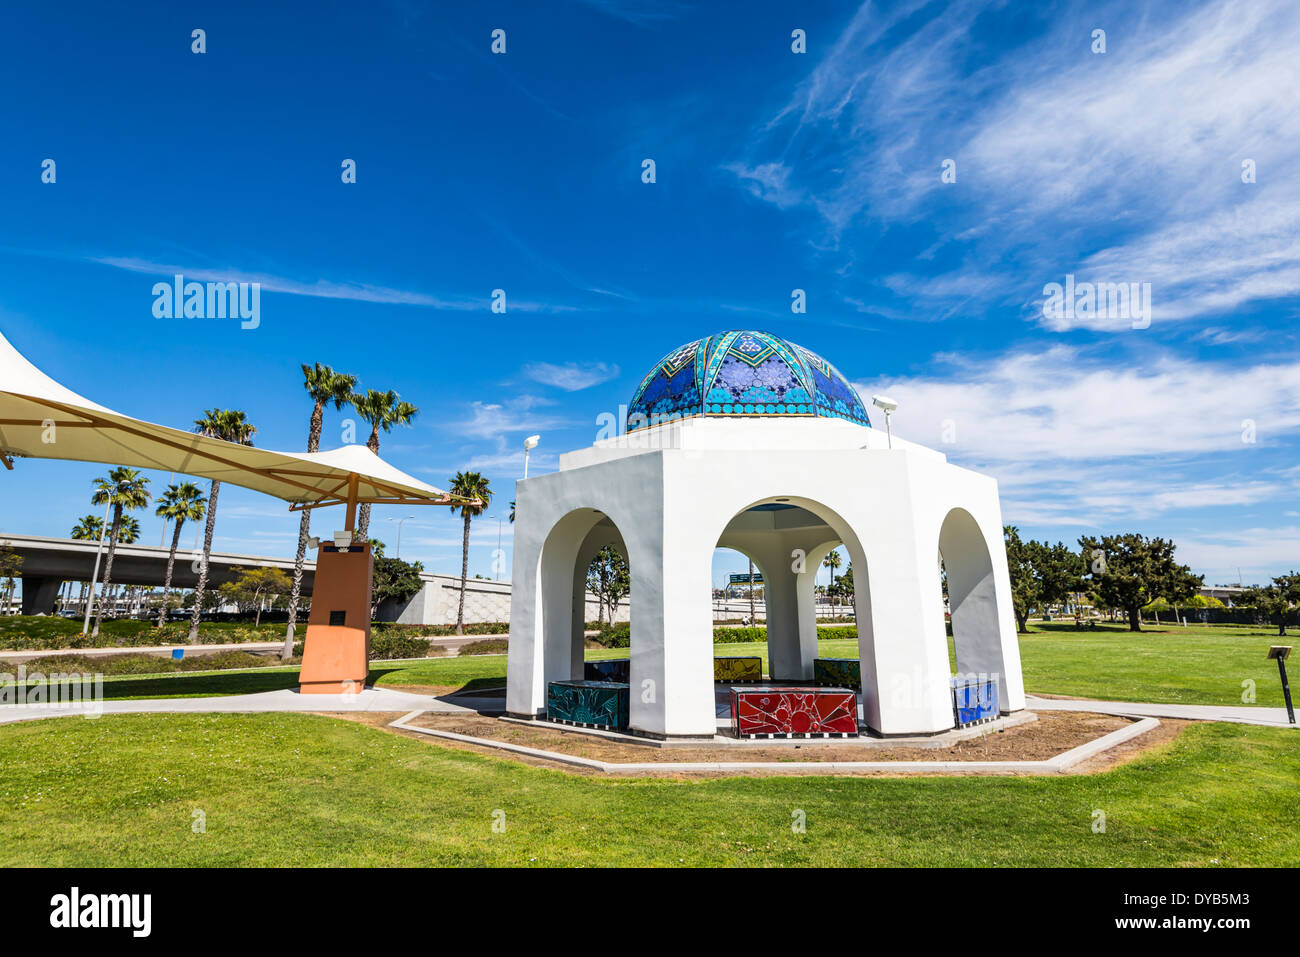 Cancer Survivors Park. San Diego, California, United States. - Stock Image